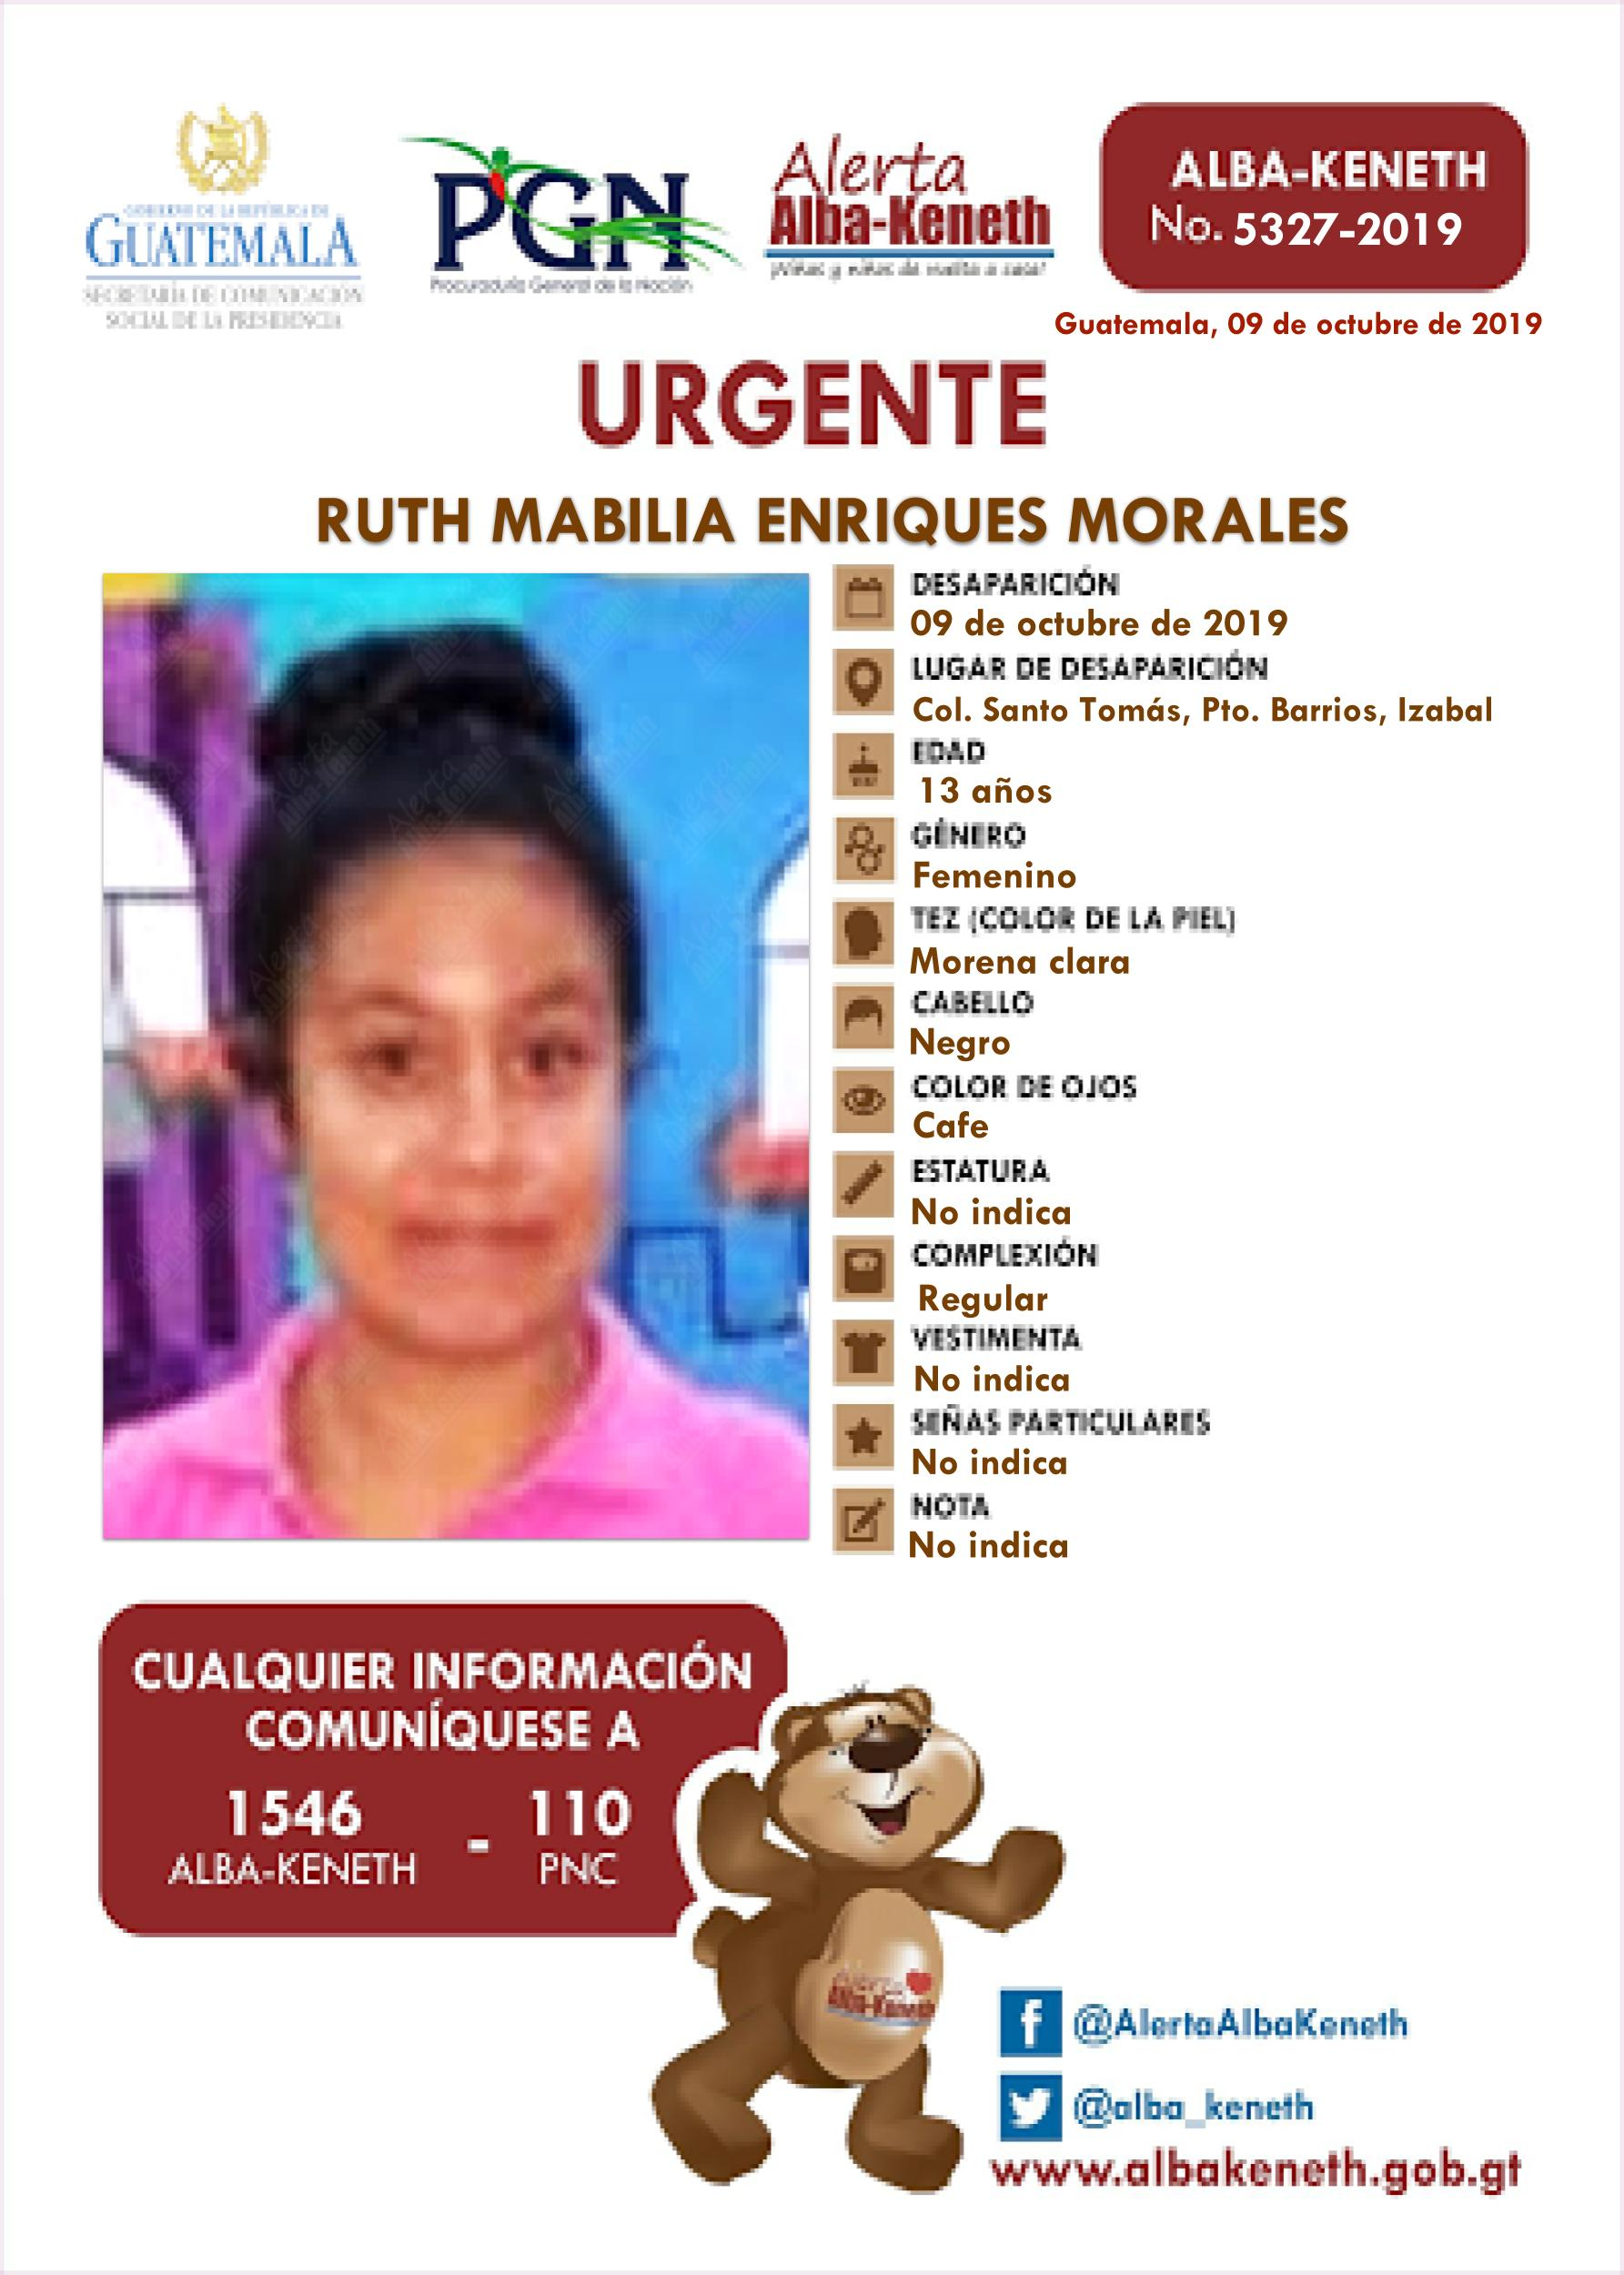 Ruth Mabilia Enriques Morales